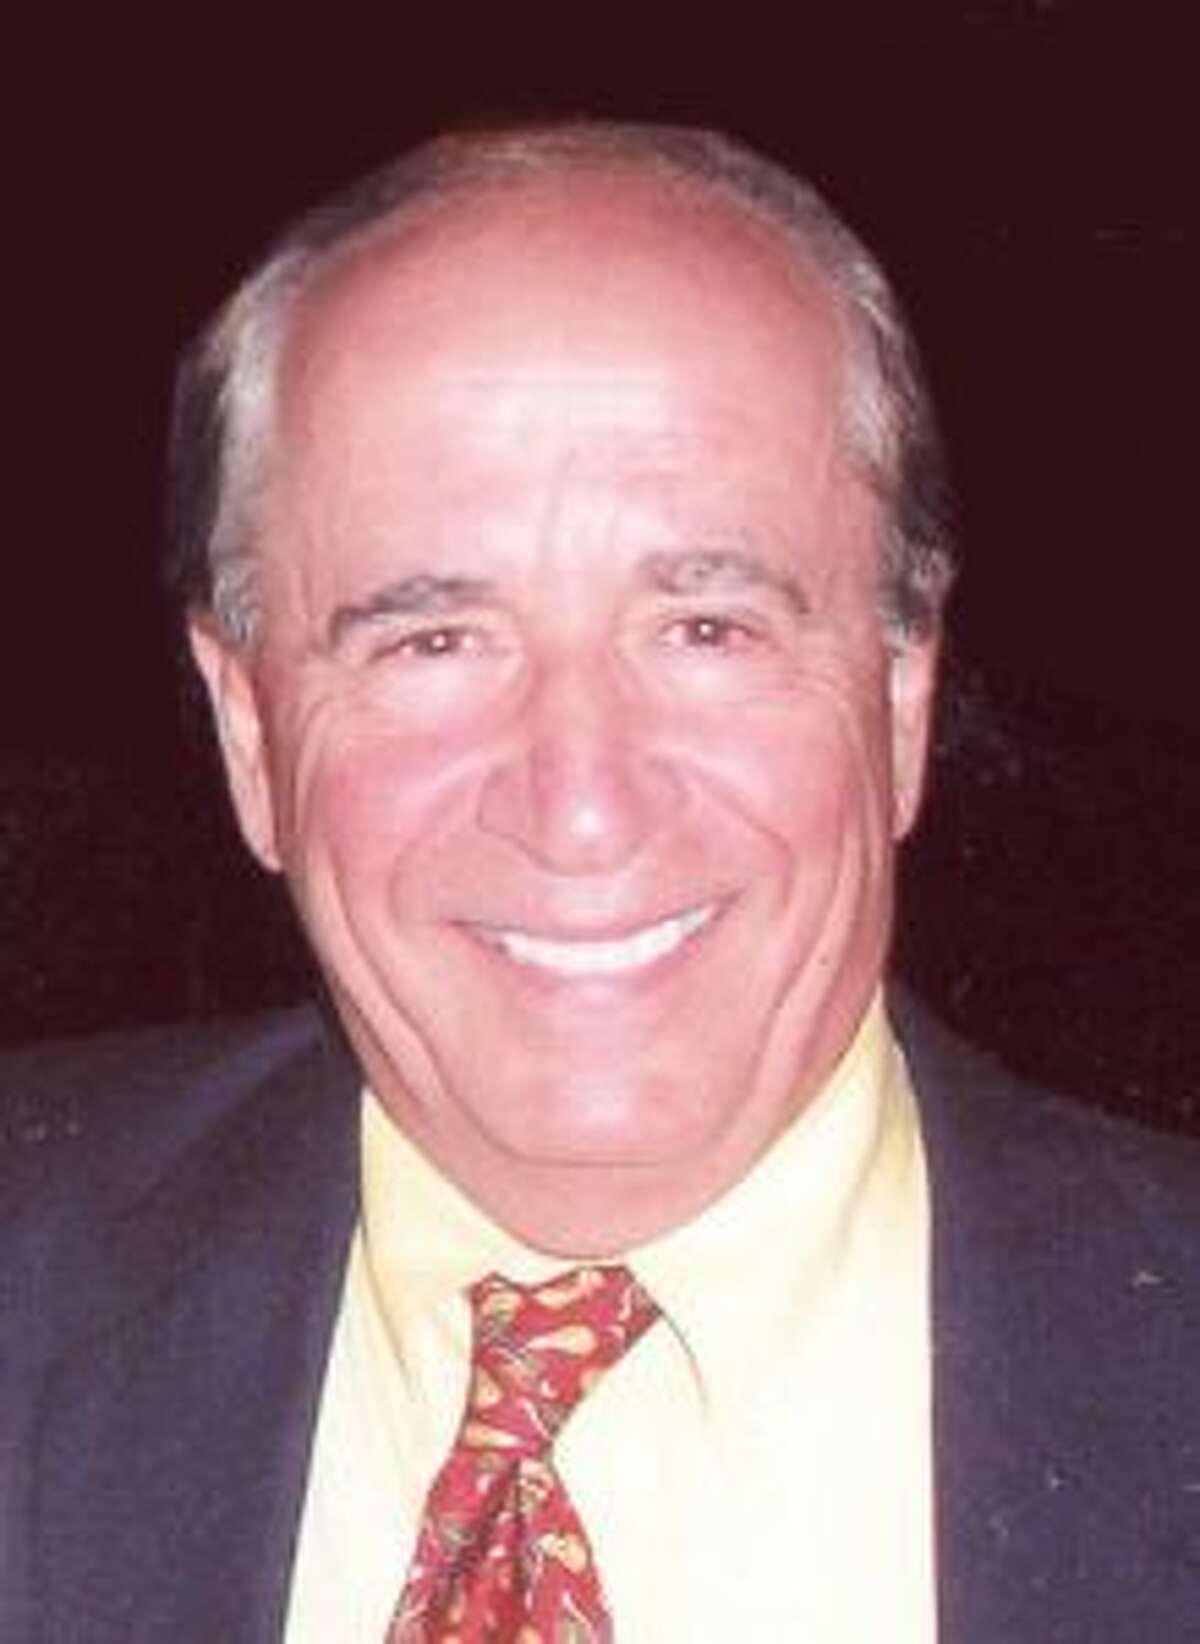 Jean-Pierre R. Bourtin